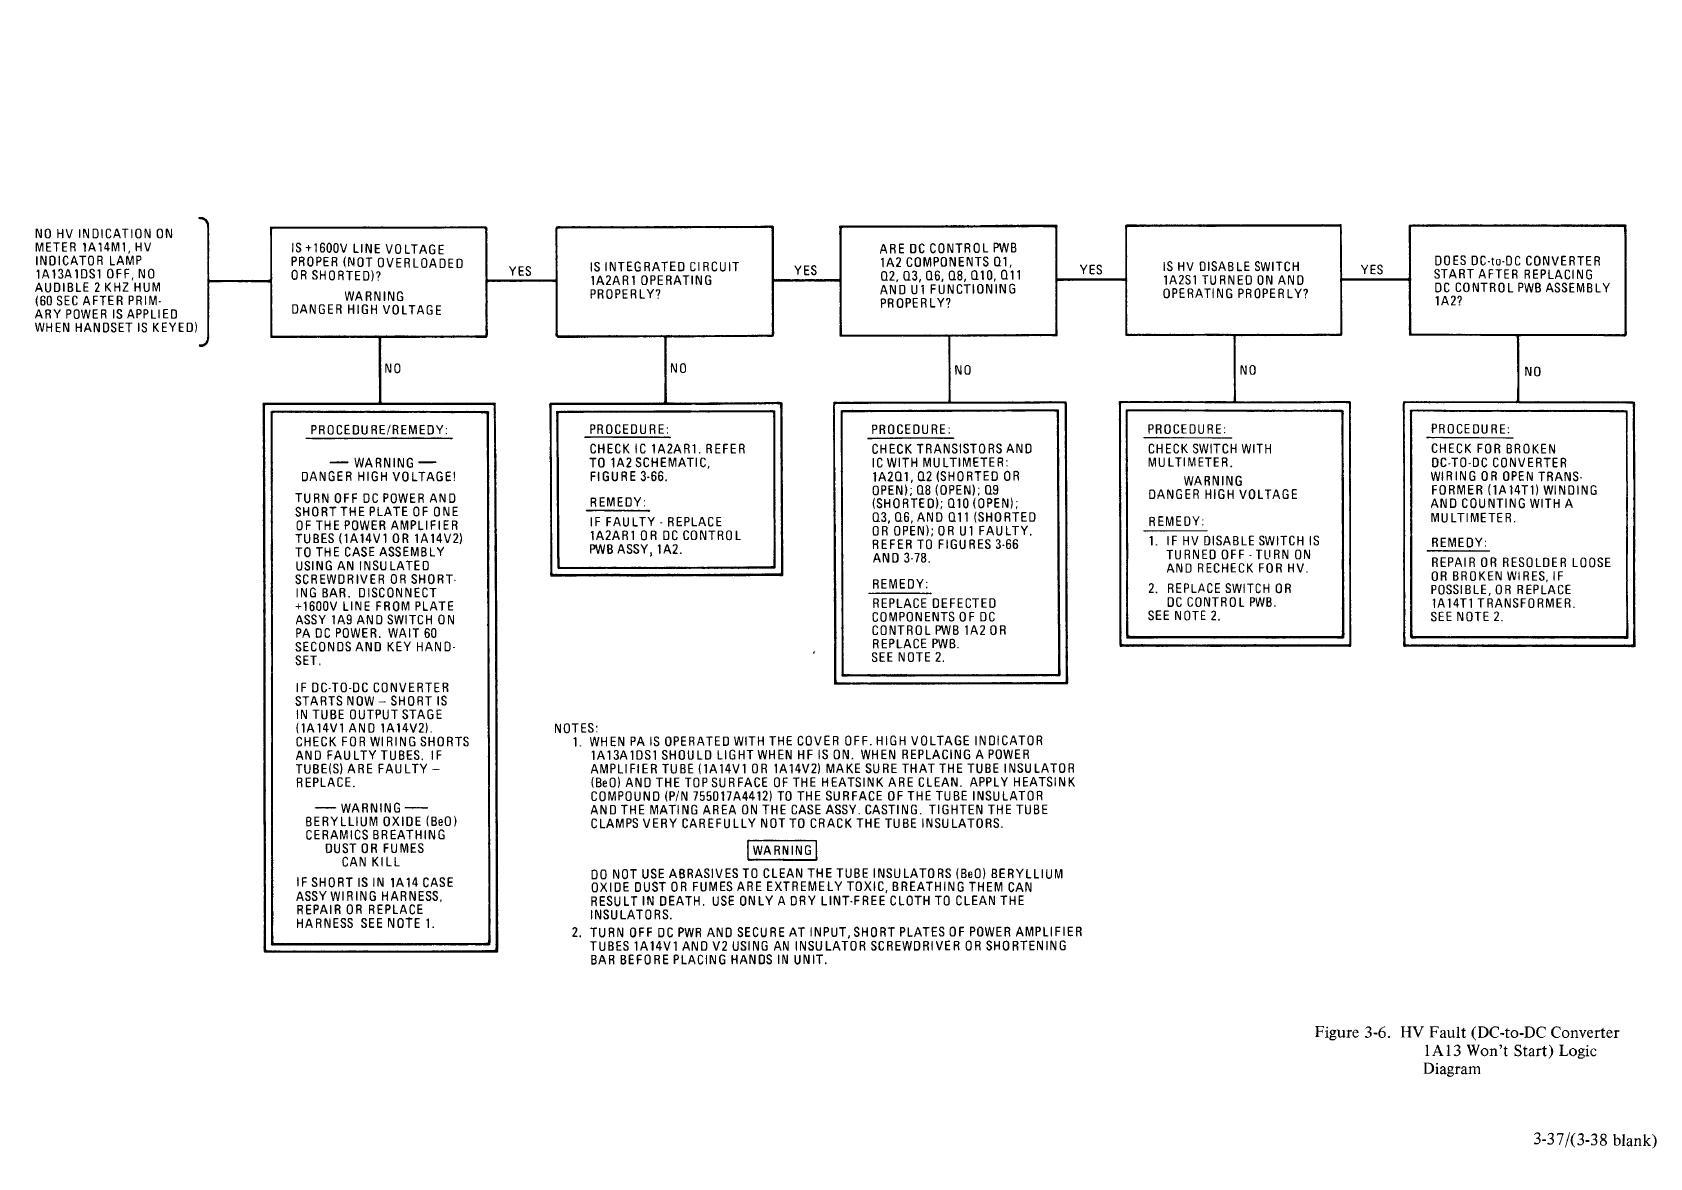 Fault Logic Diagram Wiring Diagrams Control Symbols Figure 3 6 Hv Dc To Converter 1a13 Won T Start Process Gates